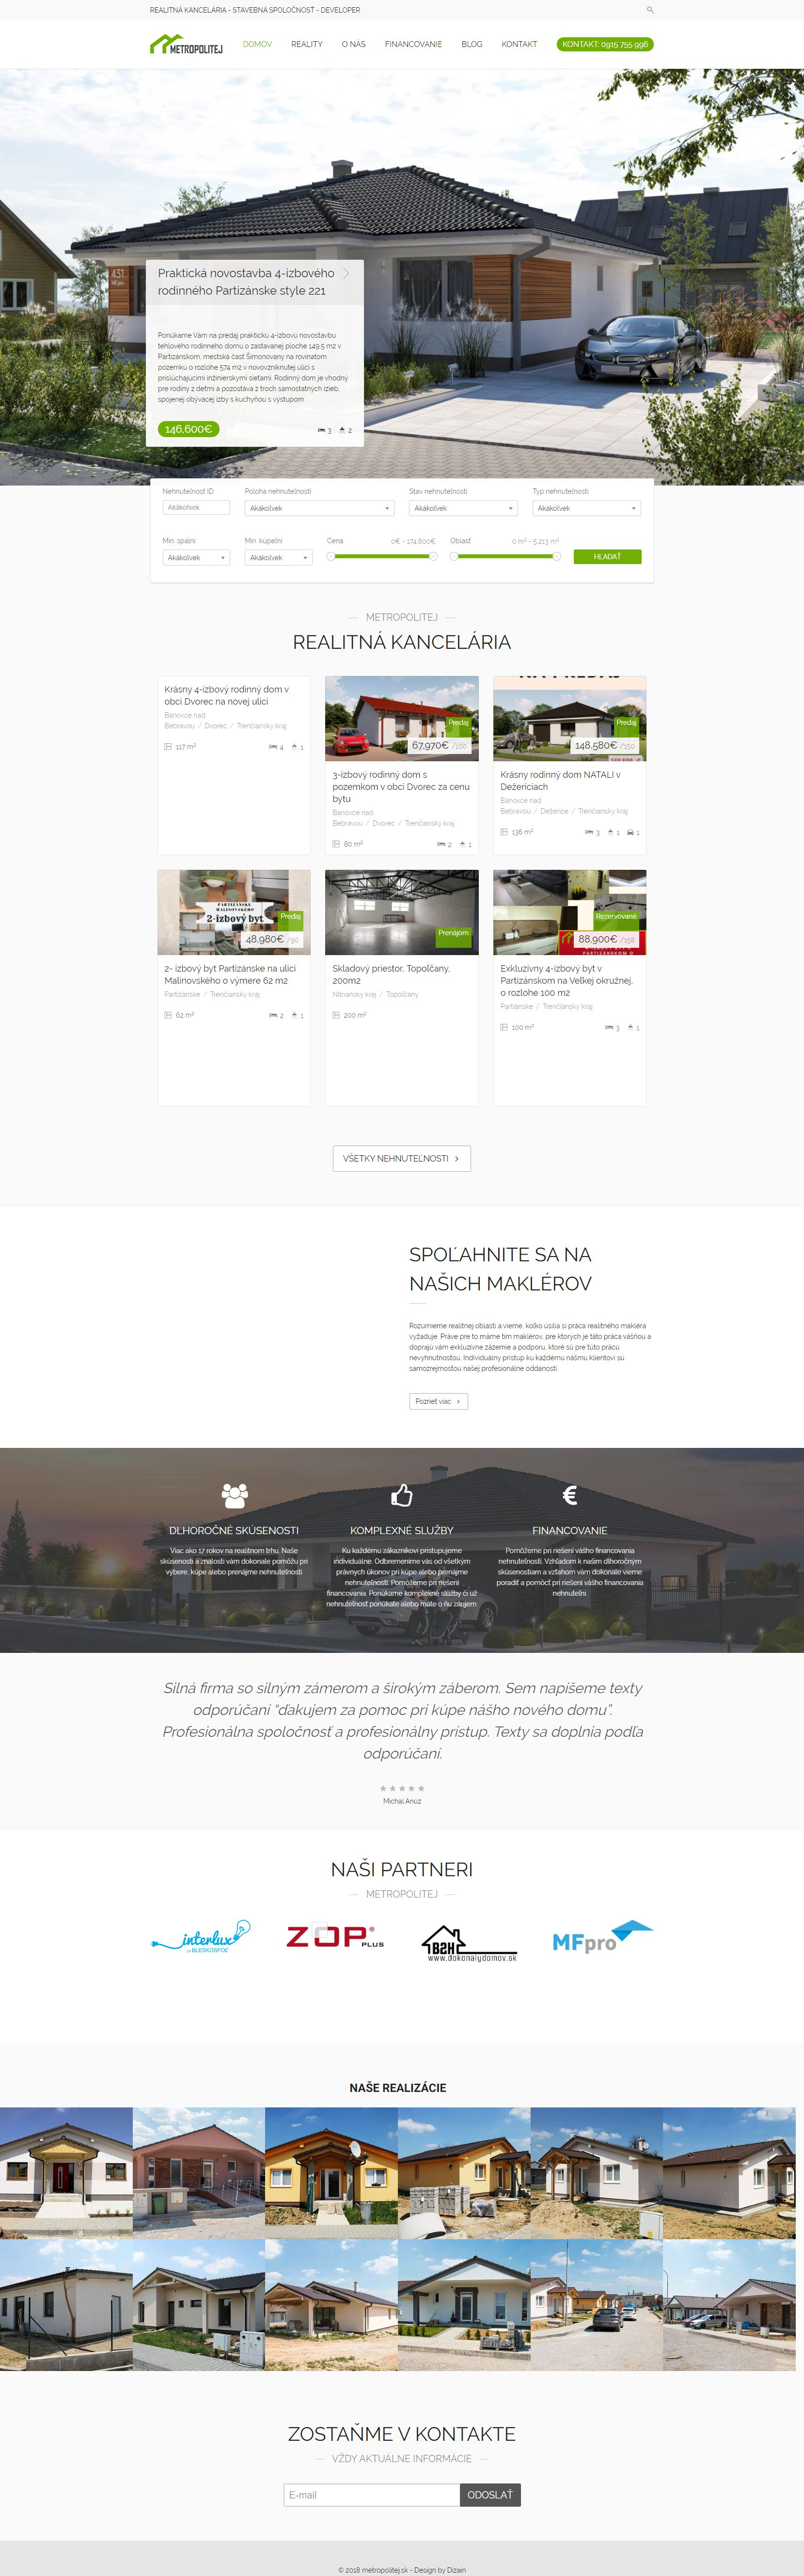 web design metropolitej